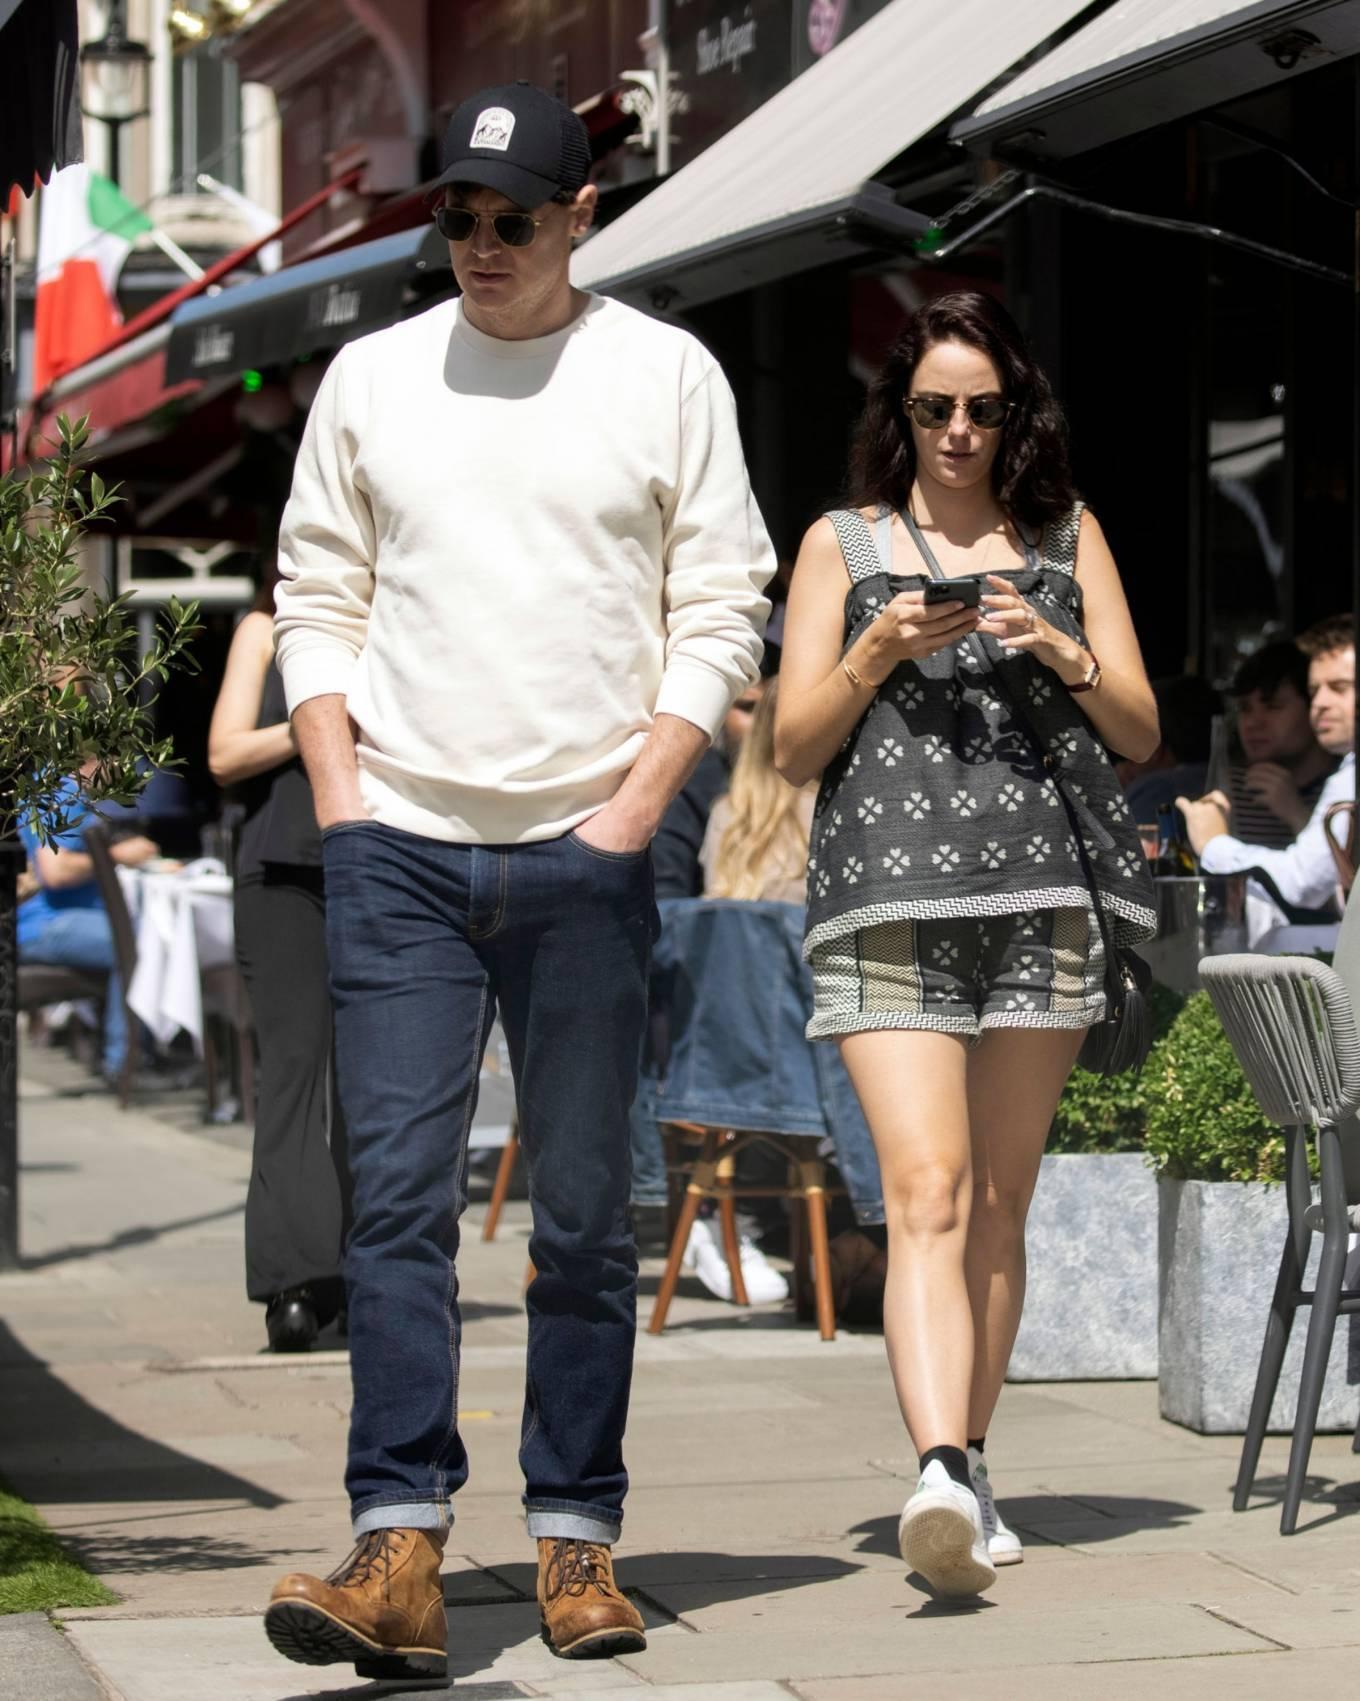 Kaya Scodelario - With her husband Benjamin Walker on street of London